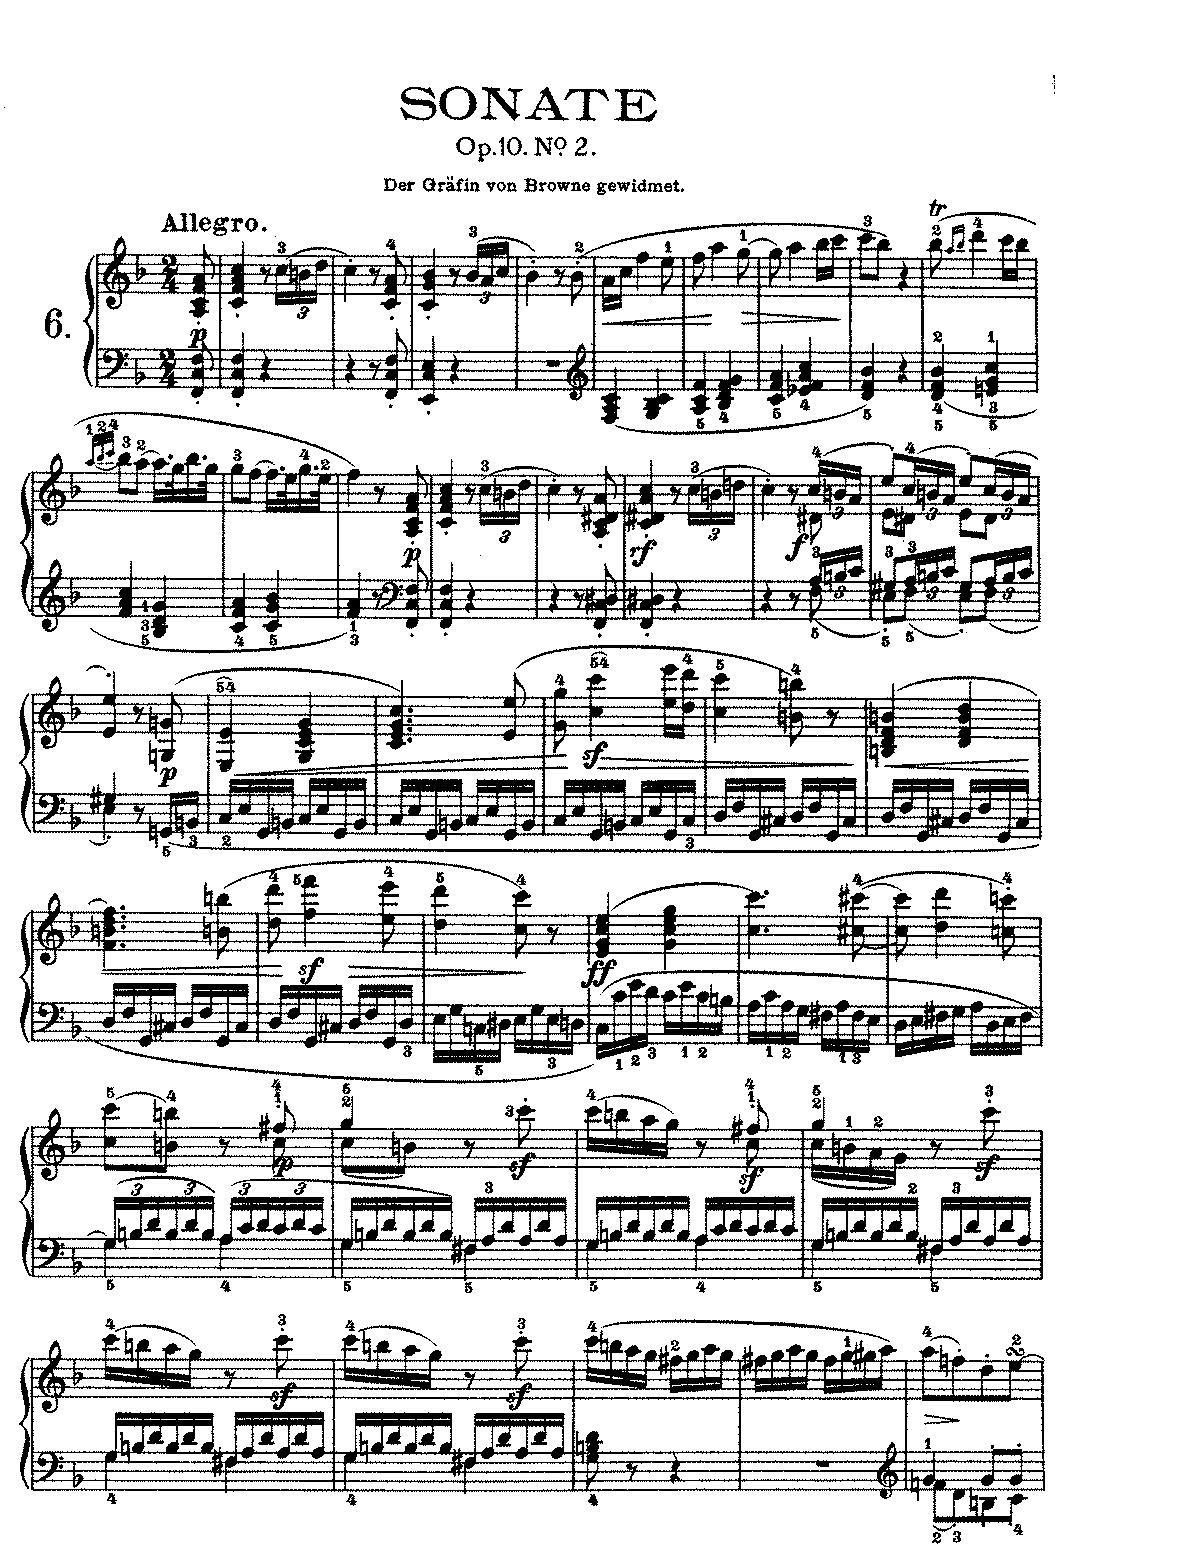 Tempest Sonata 3rd Movement